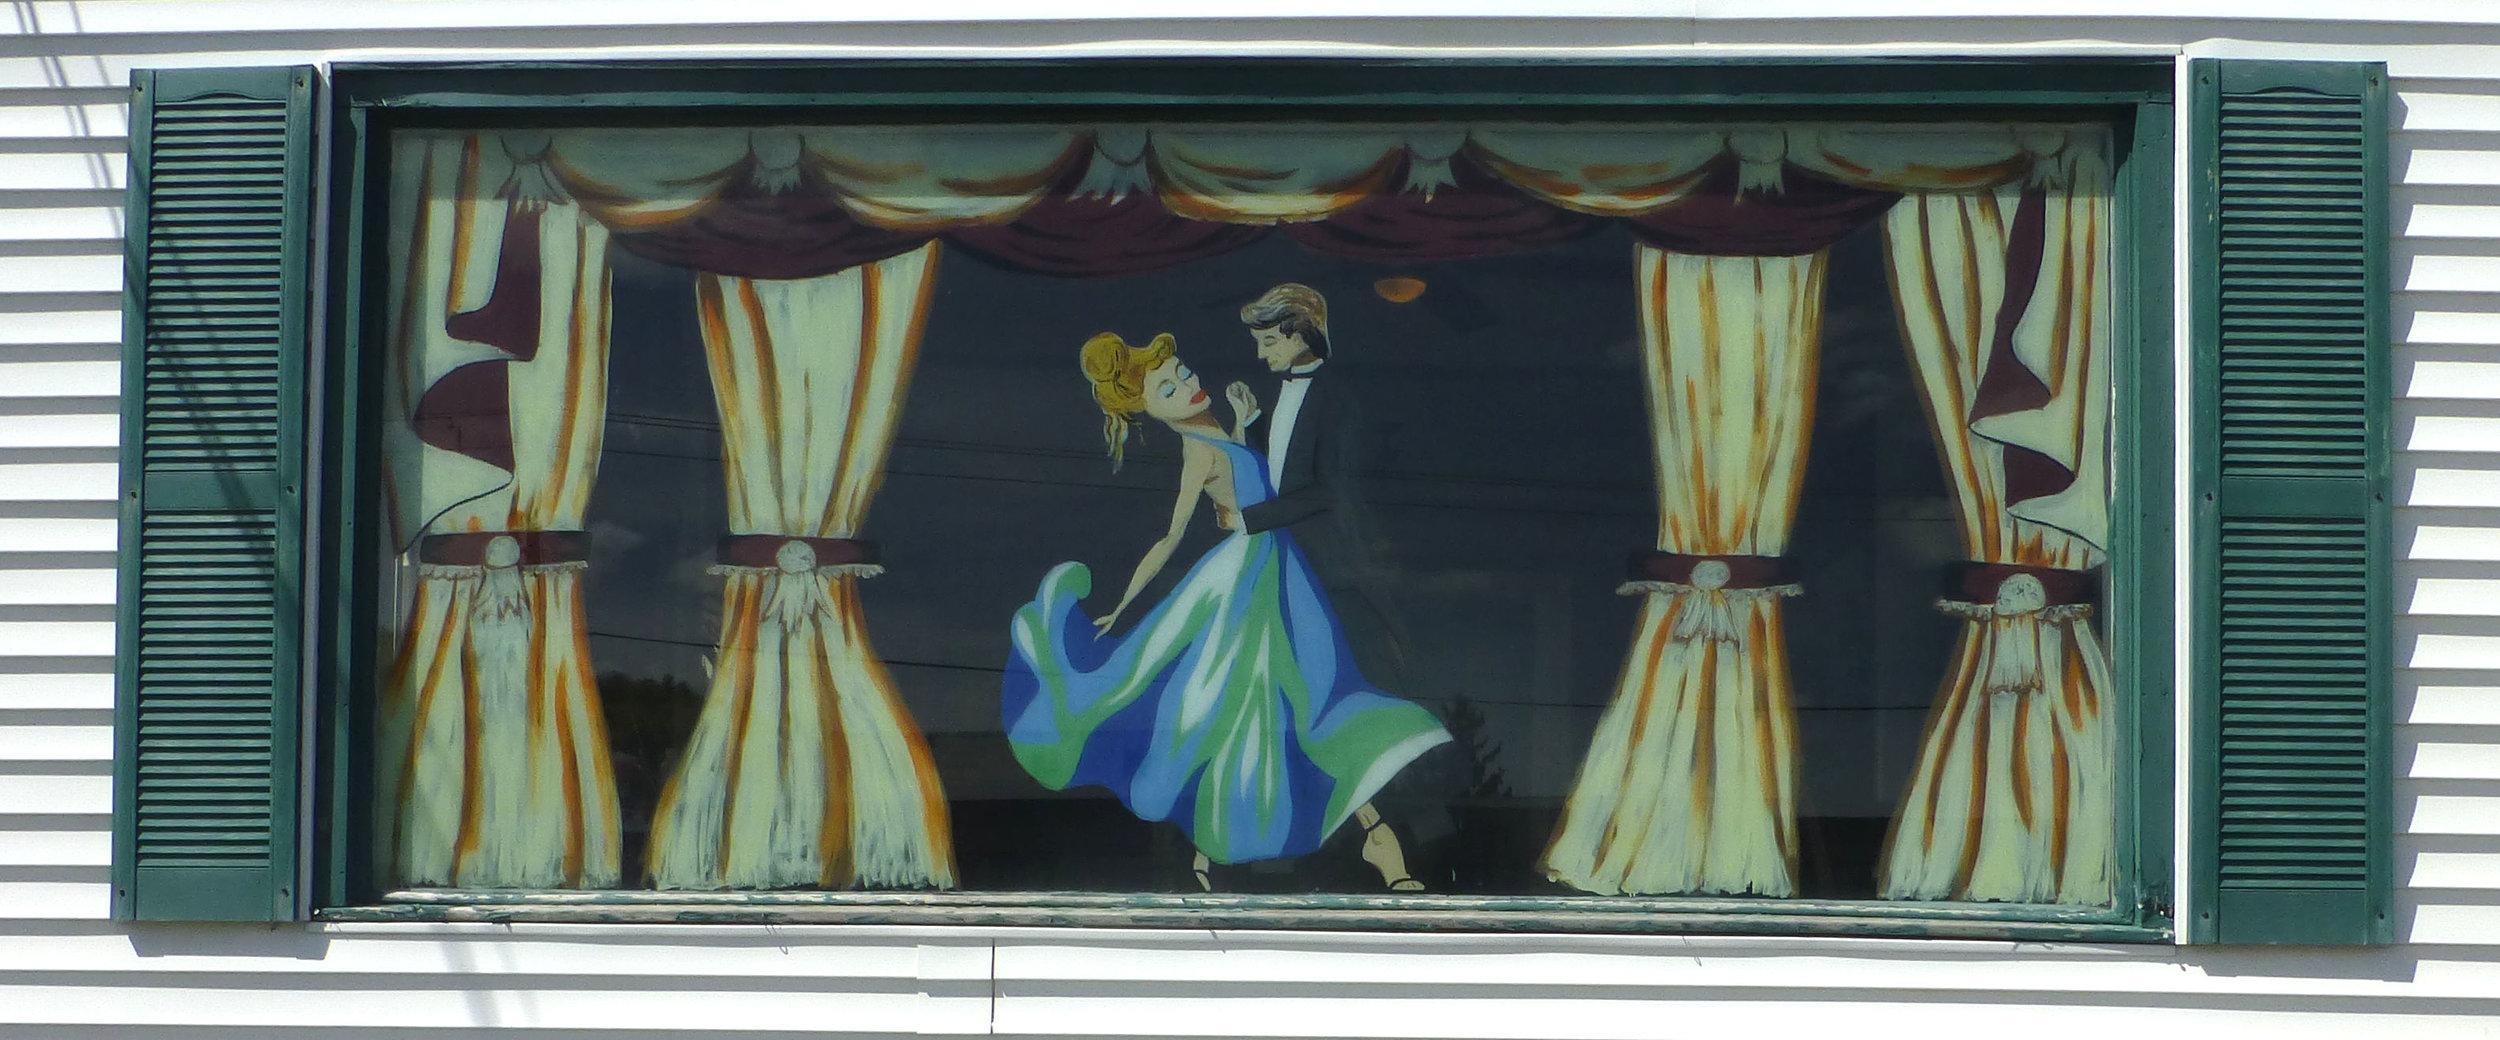 Ballroom Dancers - 11 ft x 5 ft on window